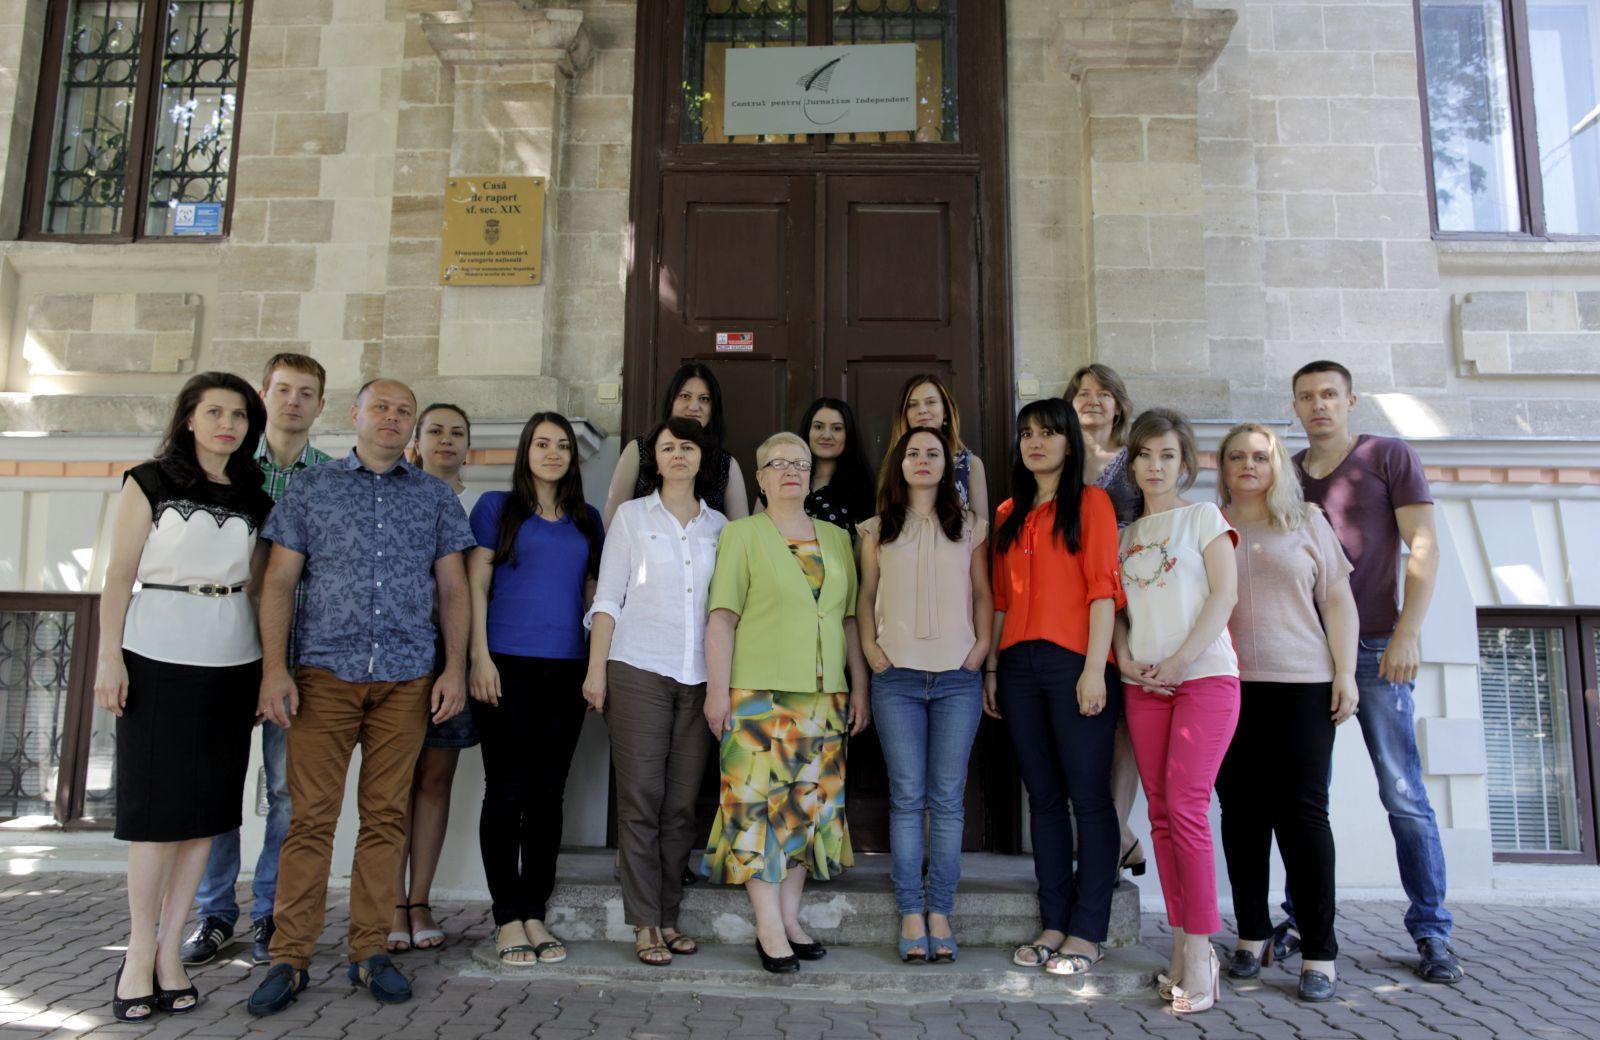 Partner impact: IJC's work in Moldova